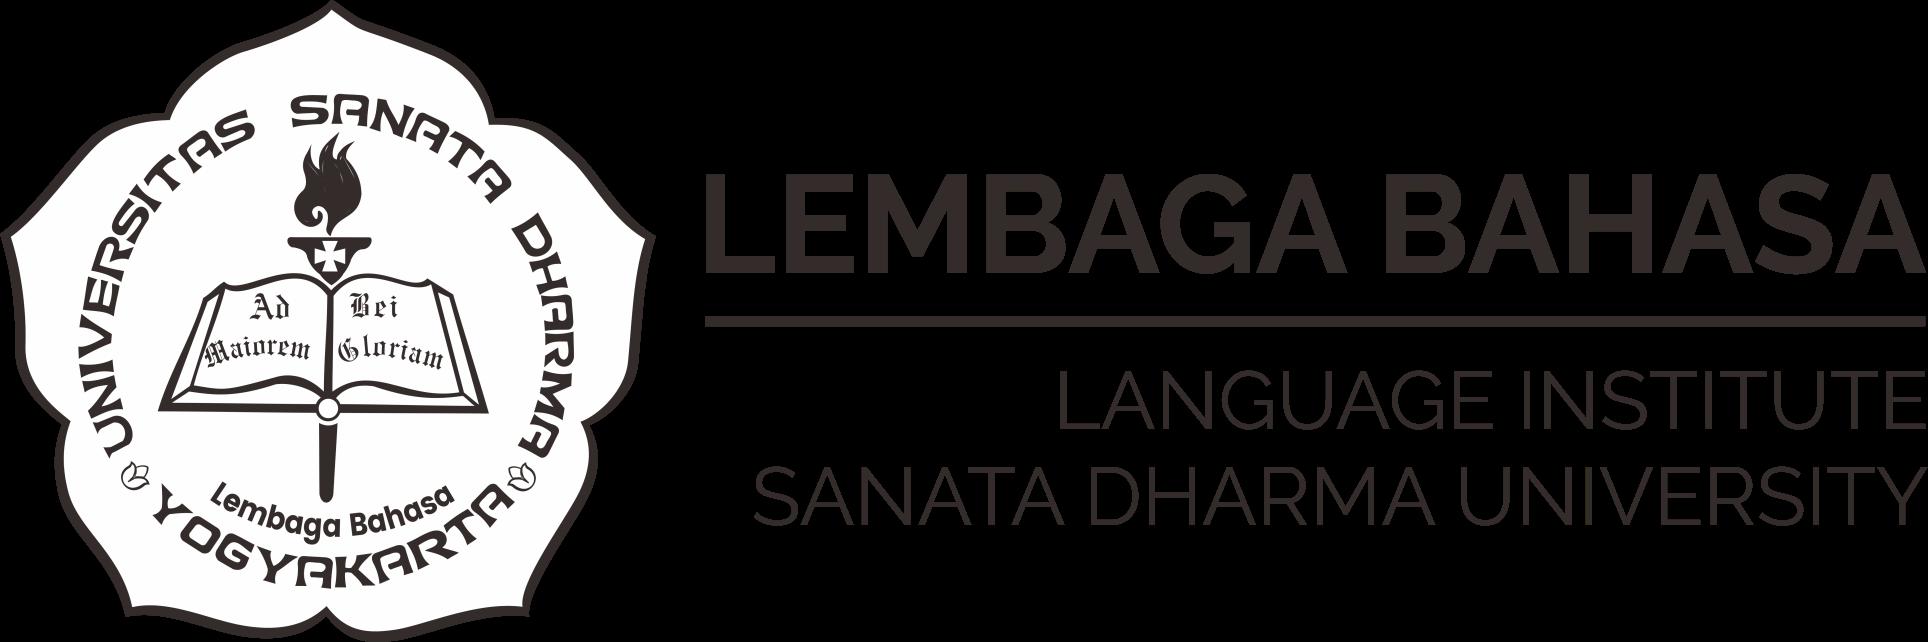 LEMBAGA BAHASA UNIVERSITAS SANATA DHARMA